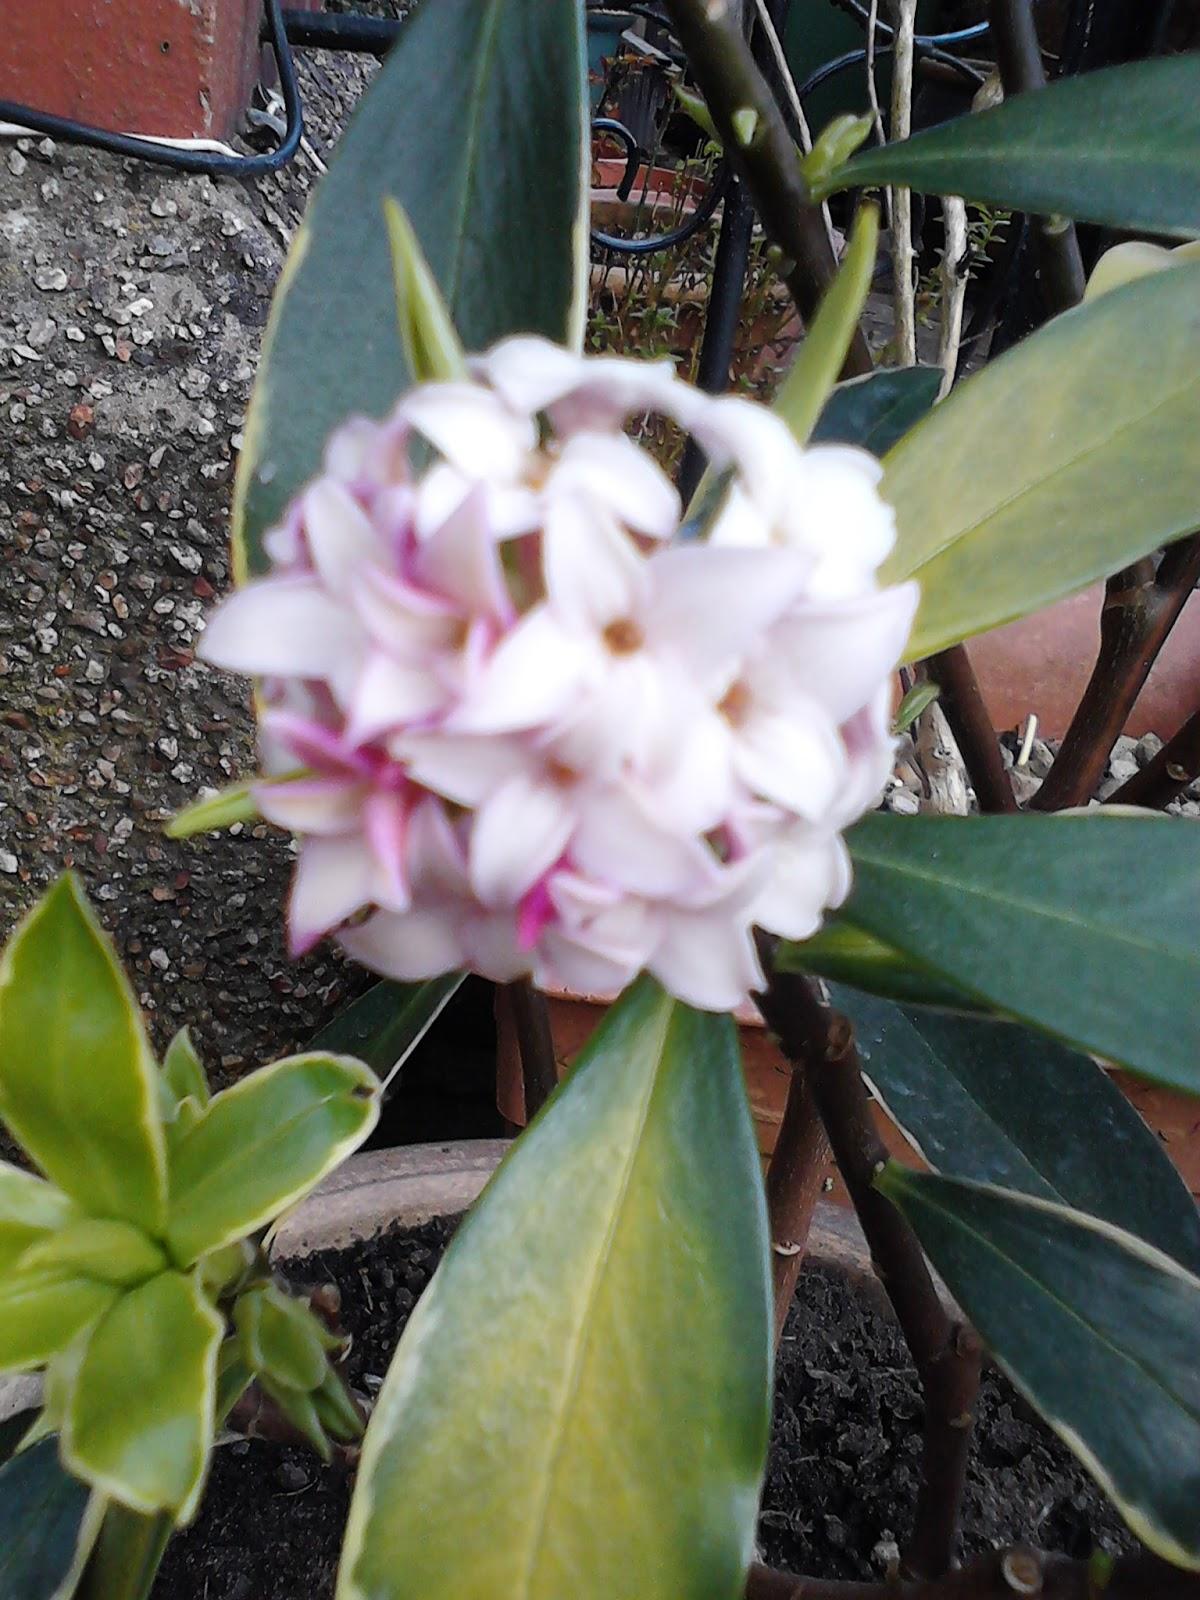 Daphne odora aureomarginata small pink flower cluster Green Fingered Blog